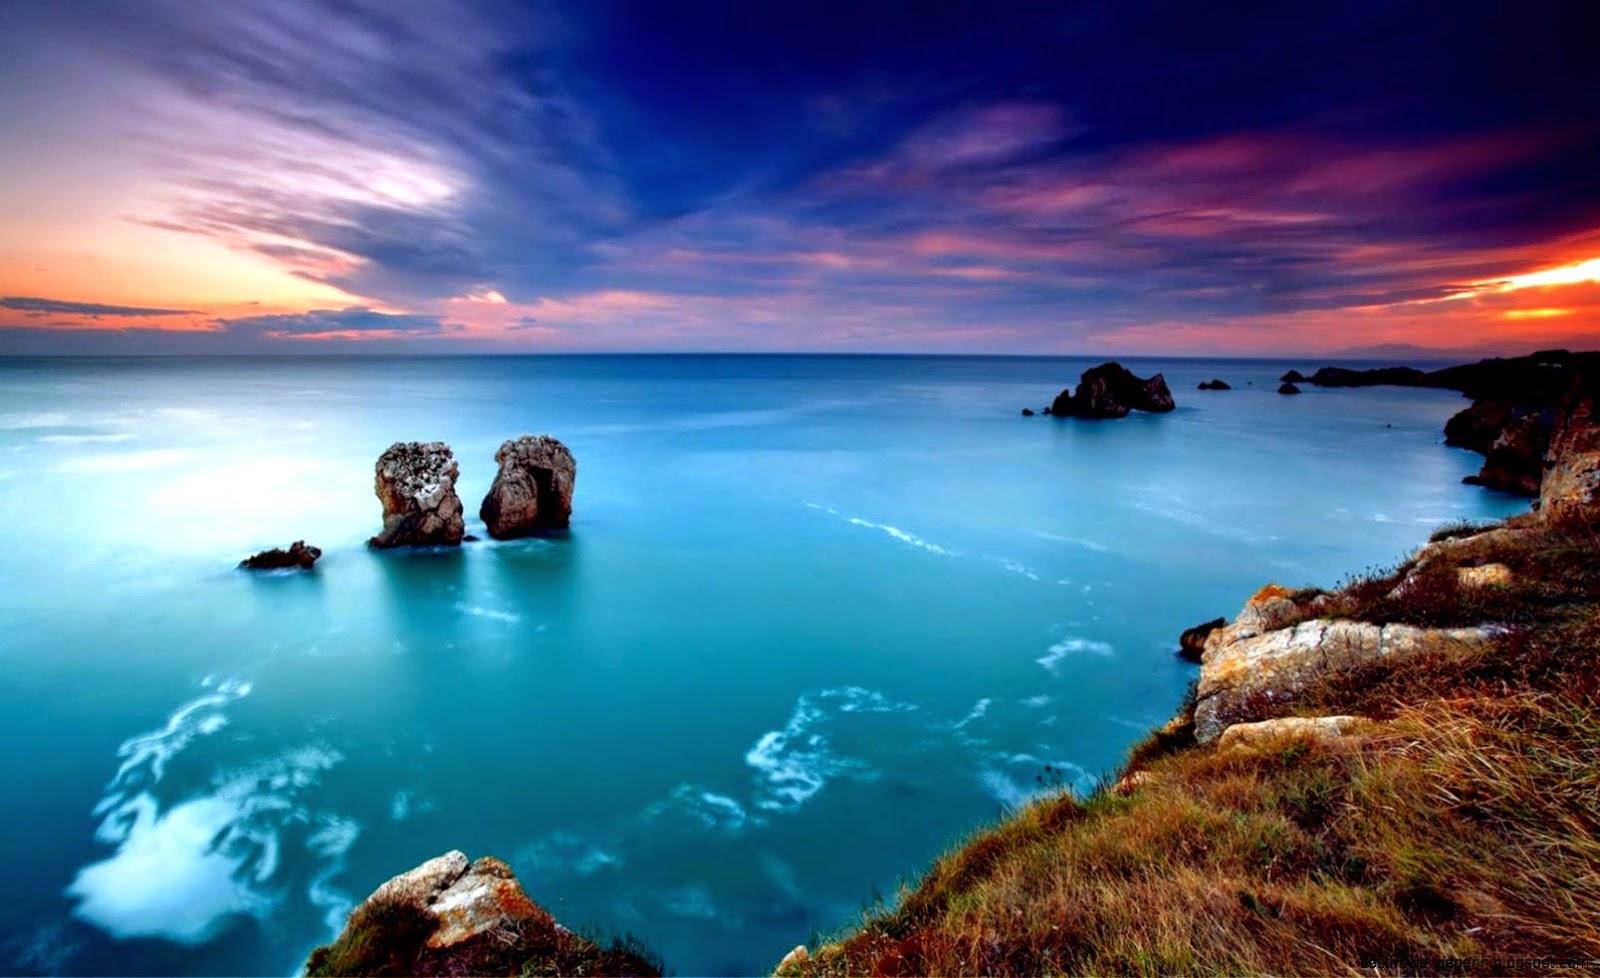 Hd Wallpapers 1080p Ocean: Ocean City Desktop Wallpaper